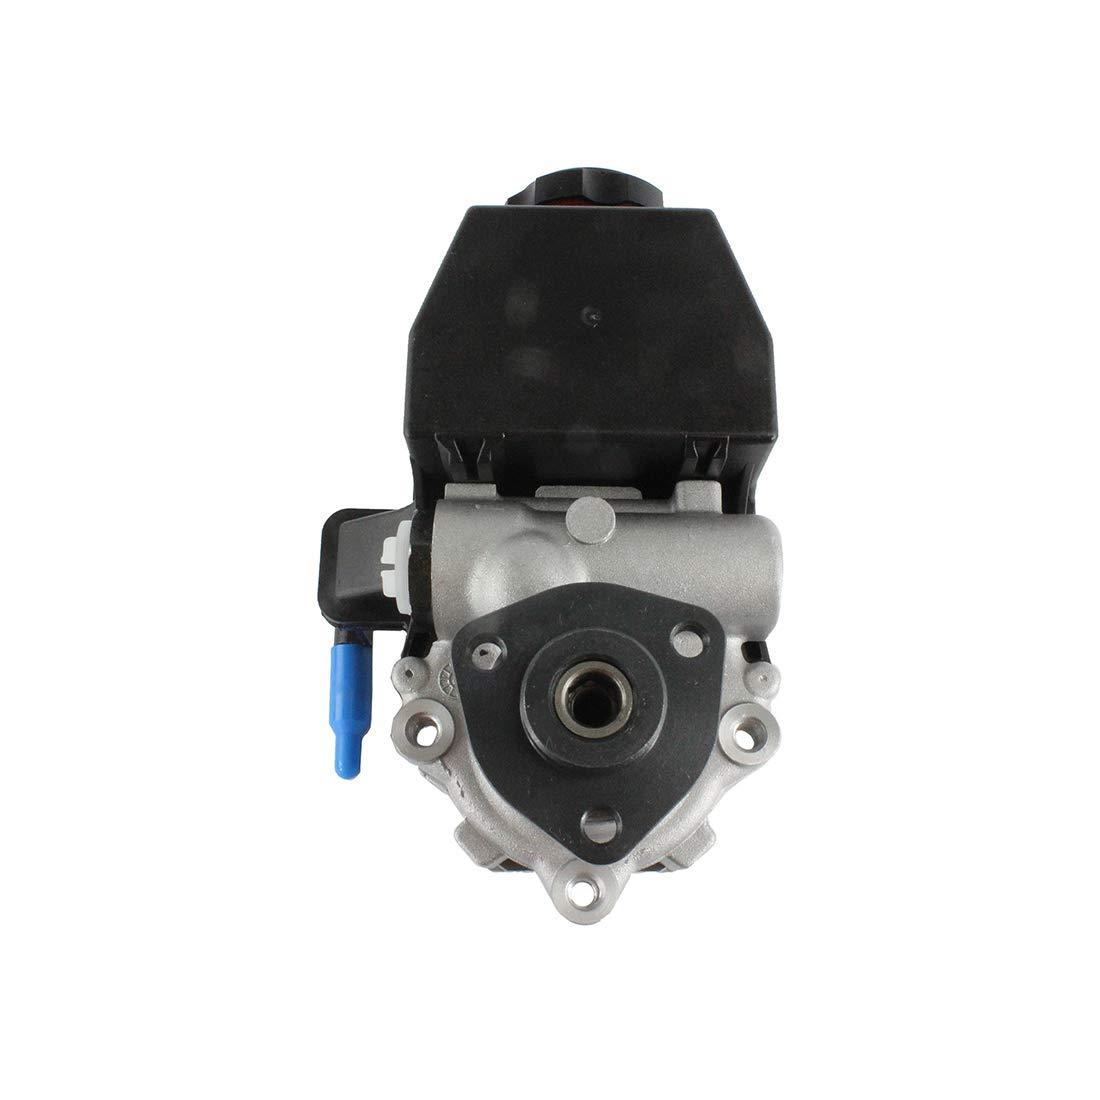 Brand new DNJ Power Steering Pump w/Reservoir PSP1287 for 96-99 / Mecedes Benz 3.0L DOCH - No Core Needed